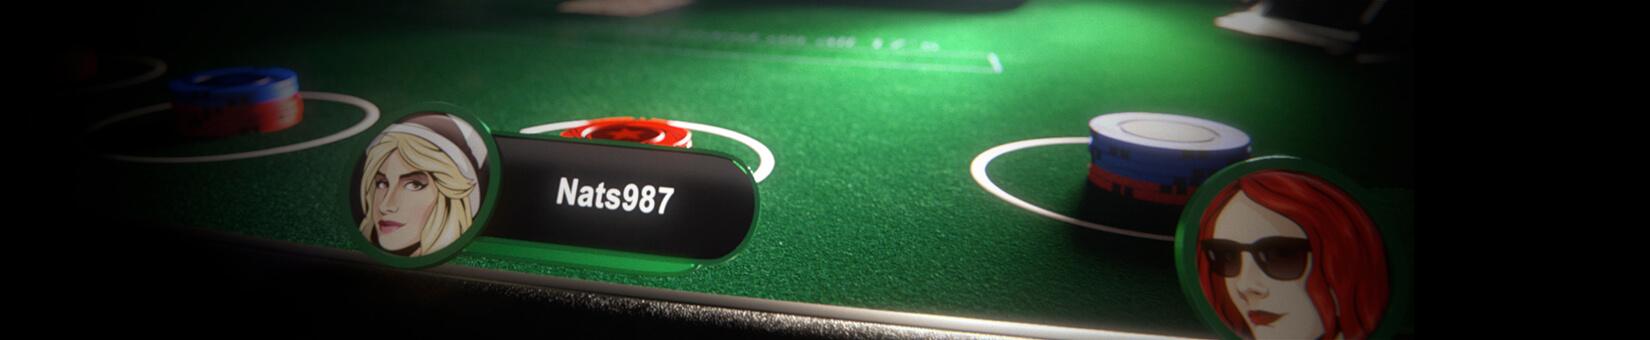 Giros gratis pokerstars juegos de Edict-323397